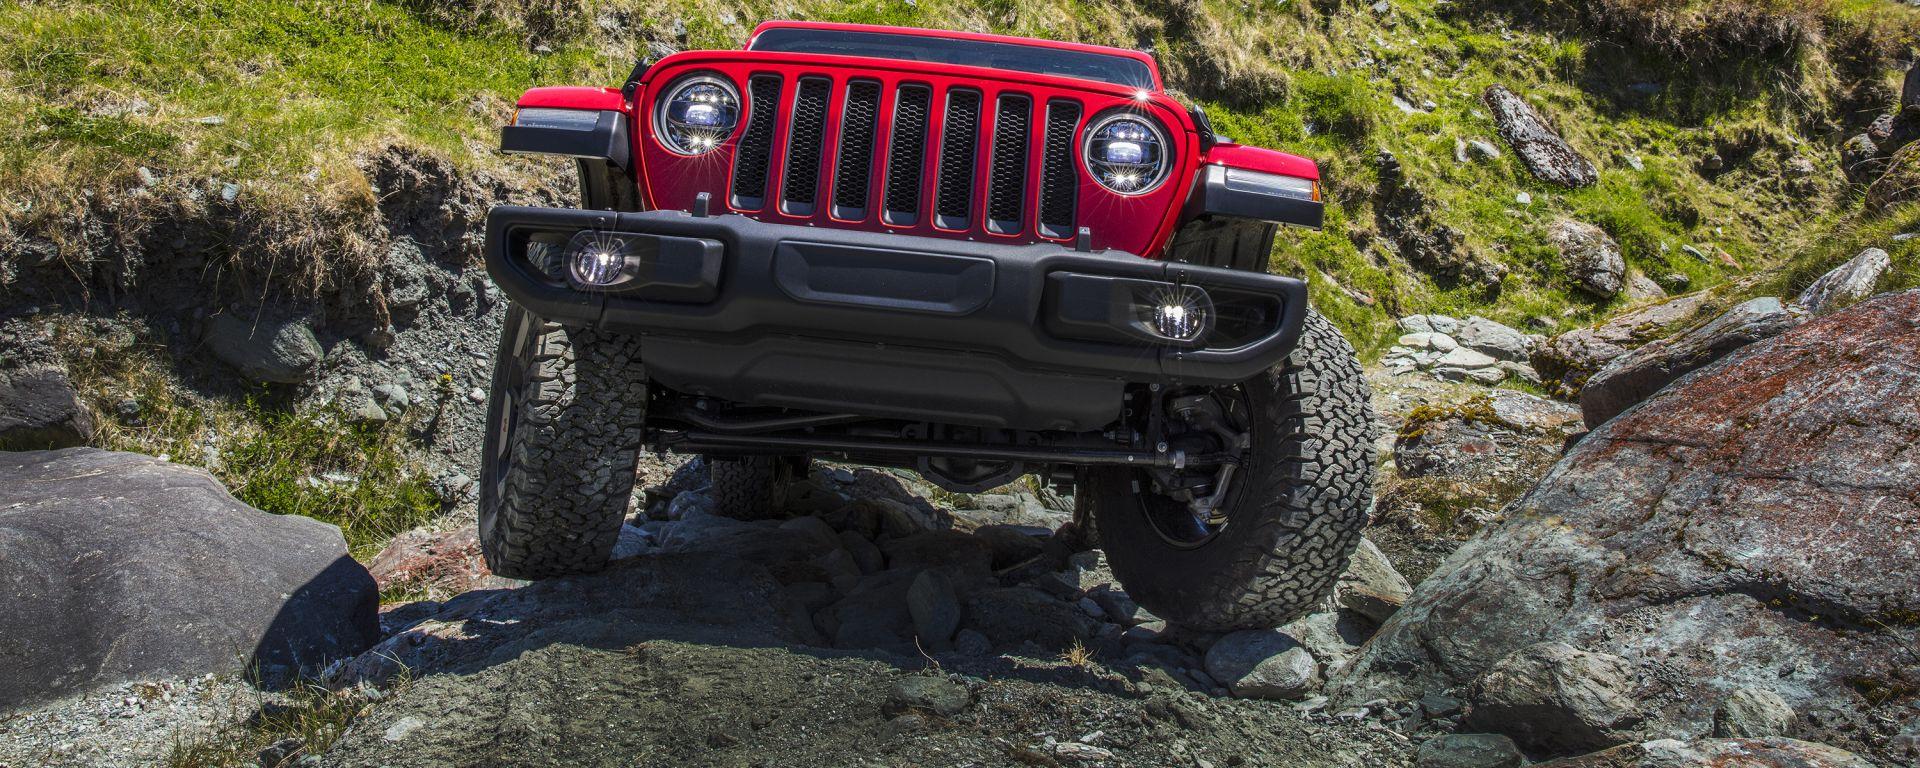 Jeep Wrangler, il frontale